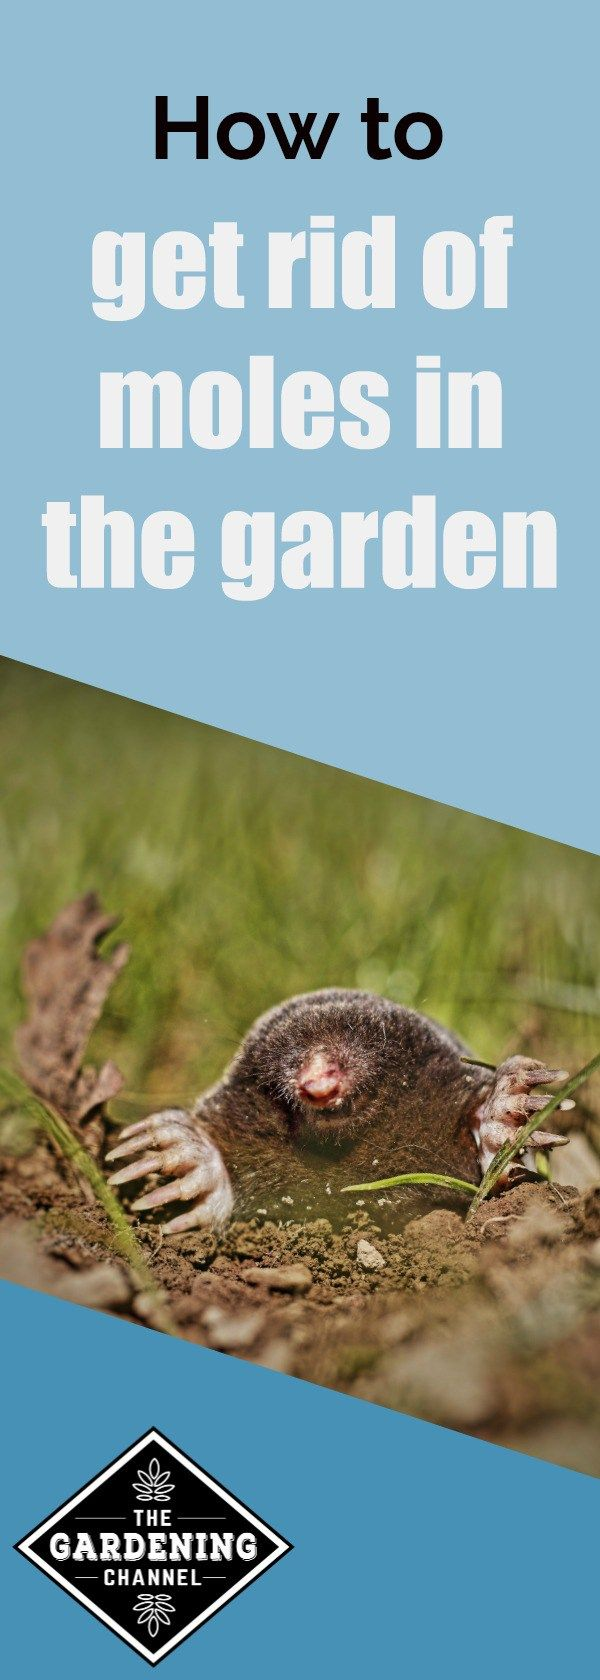 194 best Gardening Pests images on Pinterest